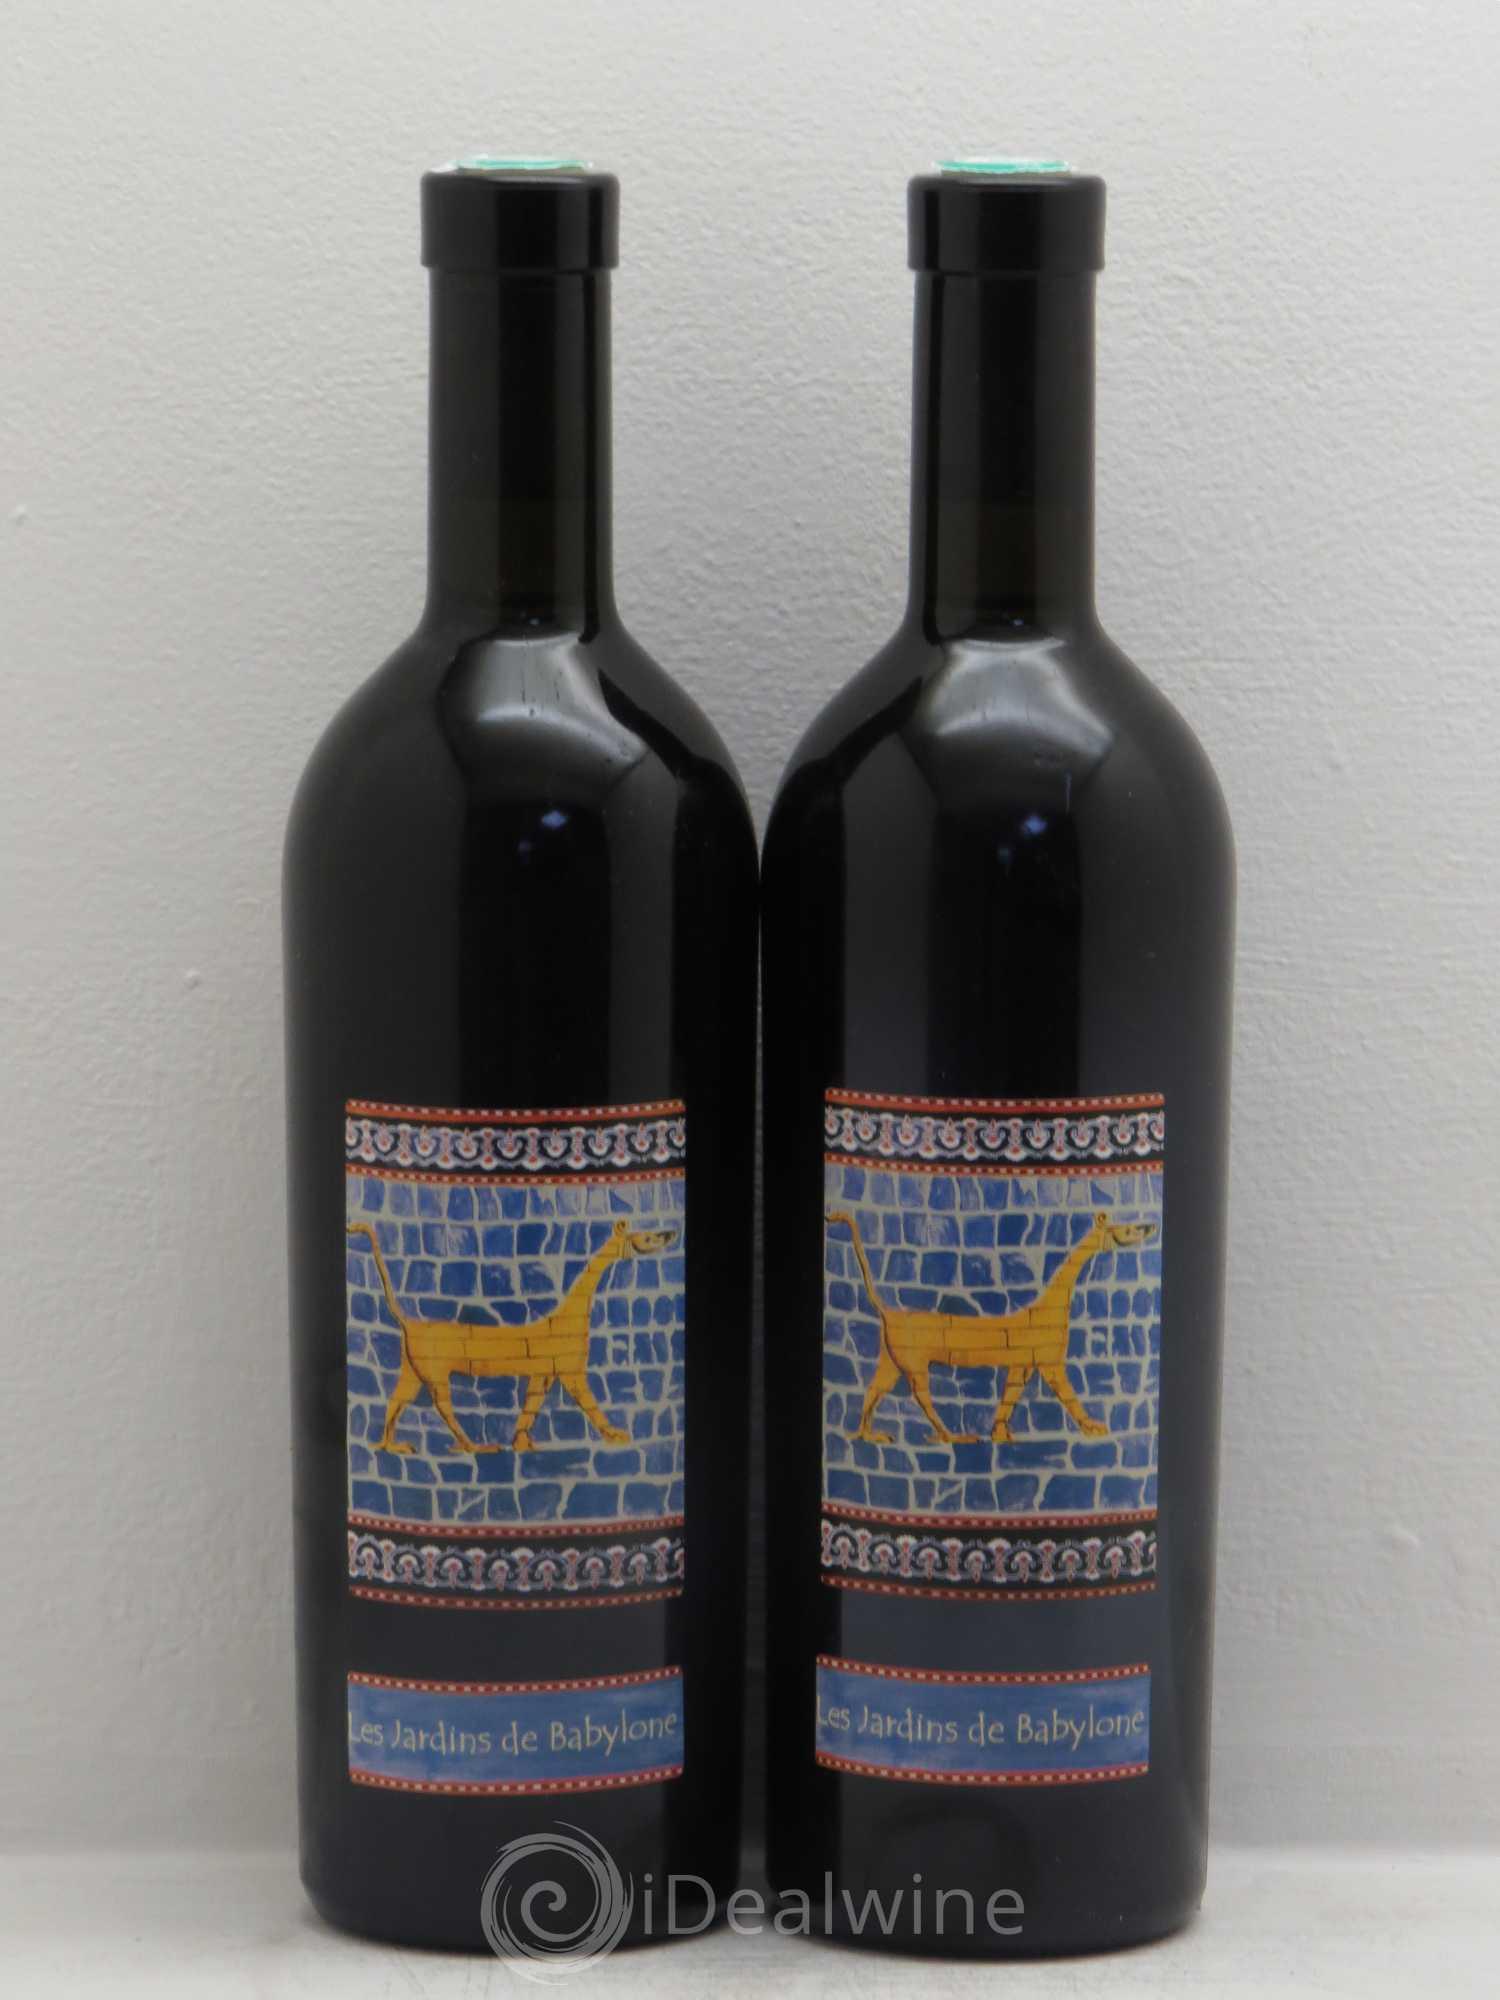 Liste des vins de jurancon en vente idealwine for Jardin de babylone wine